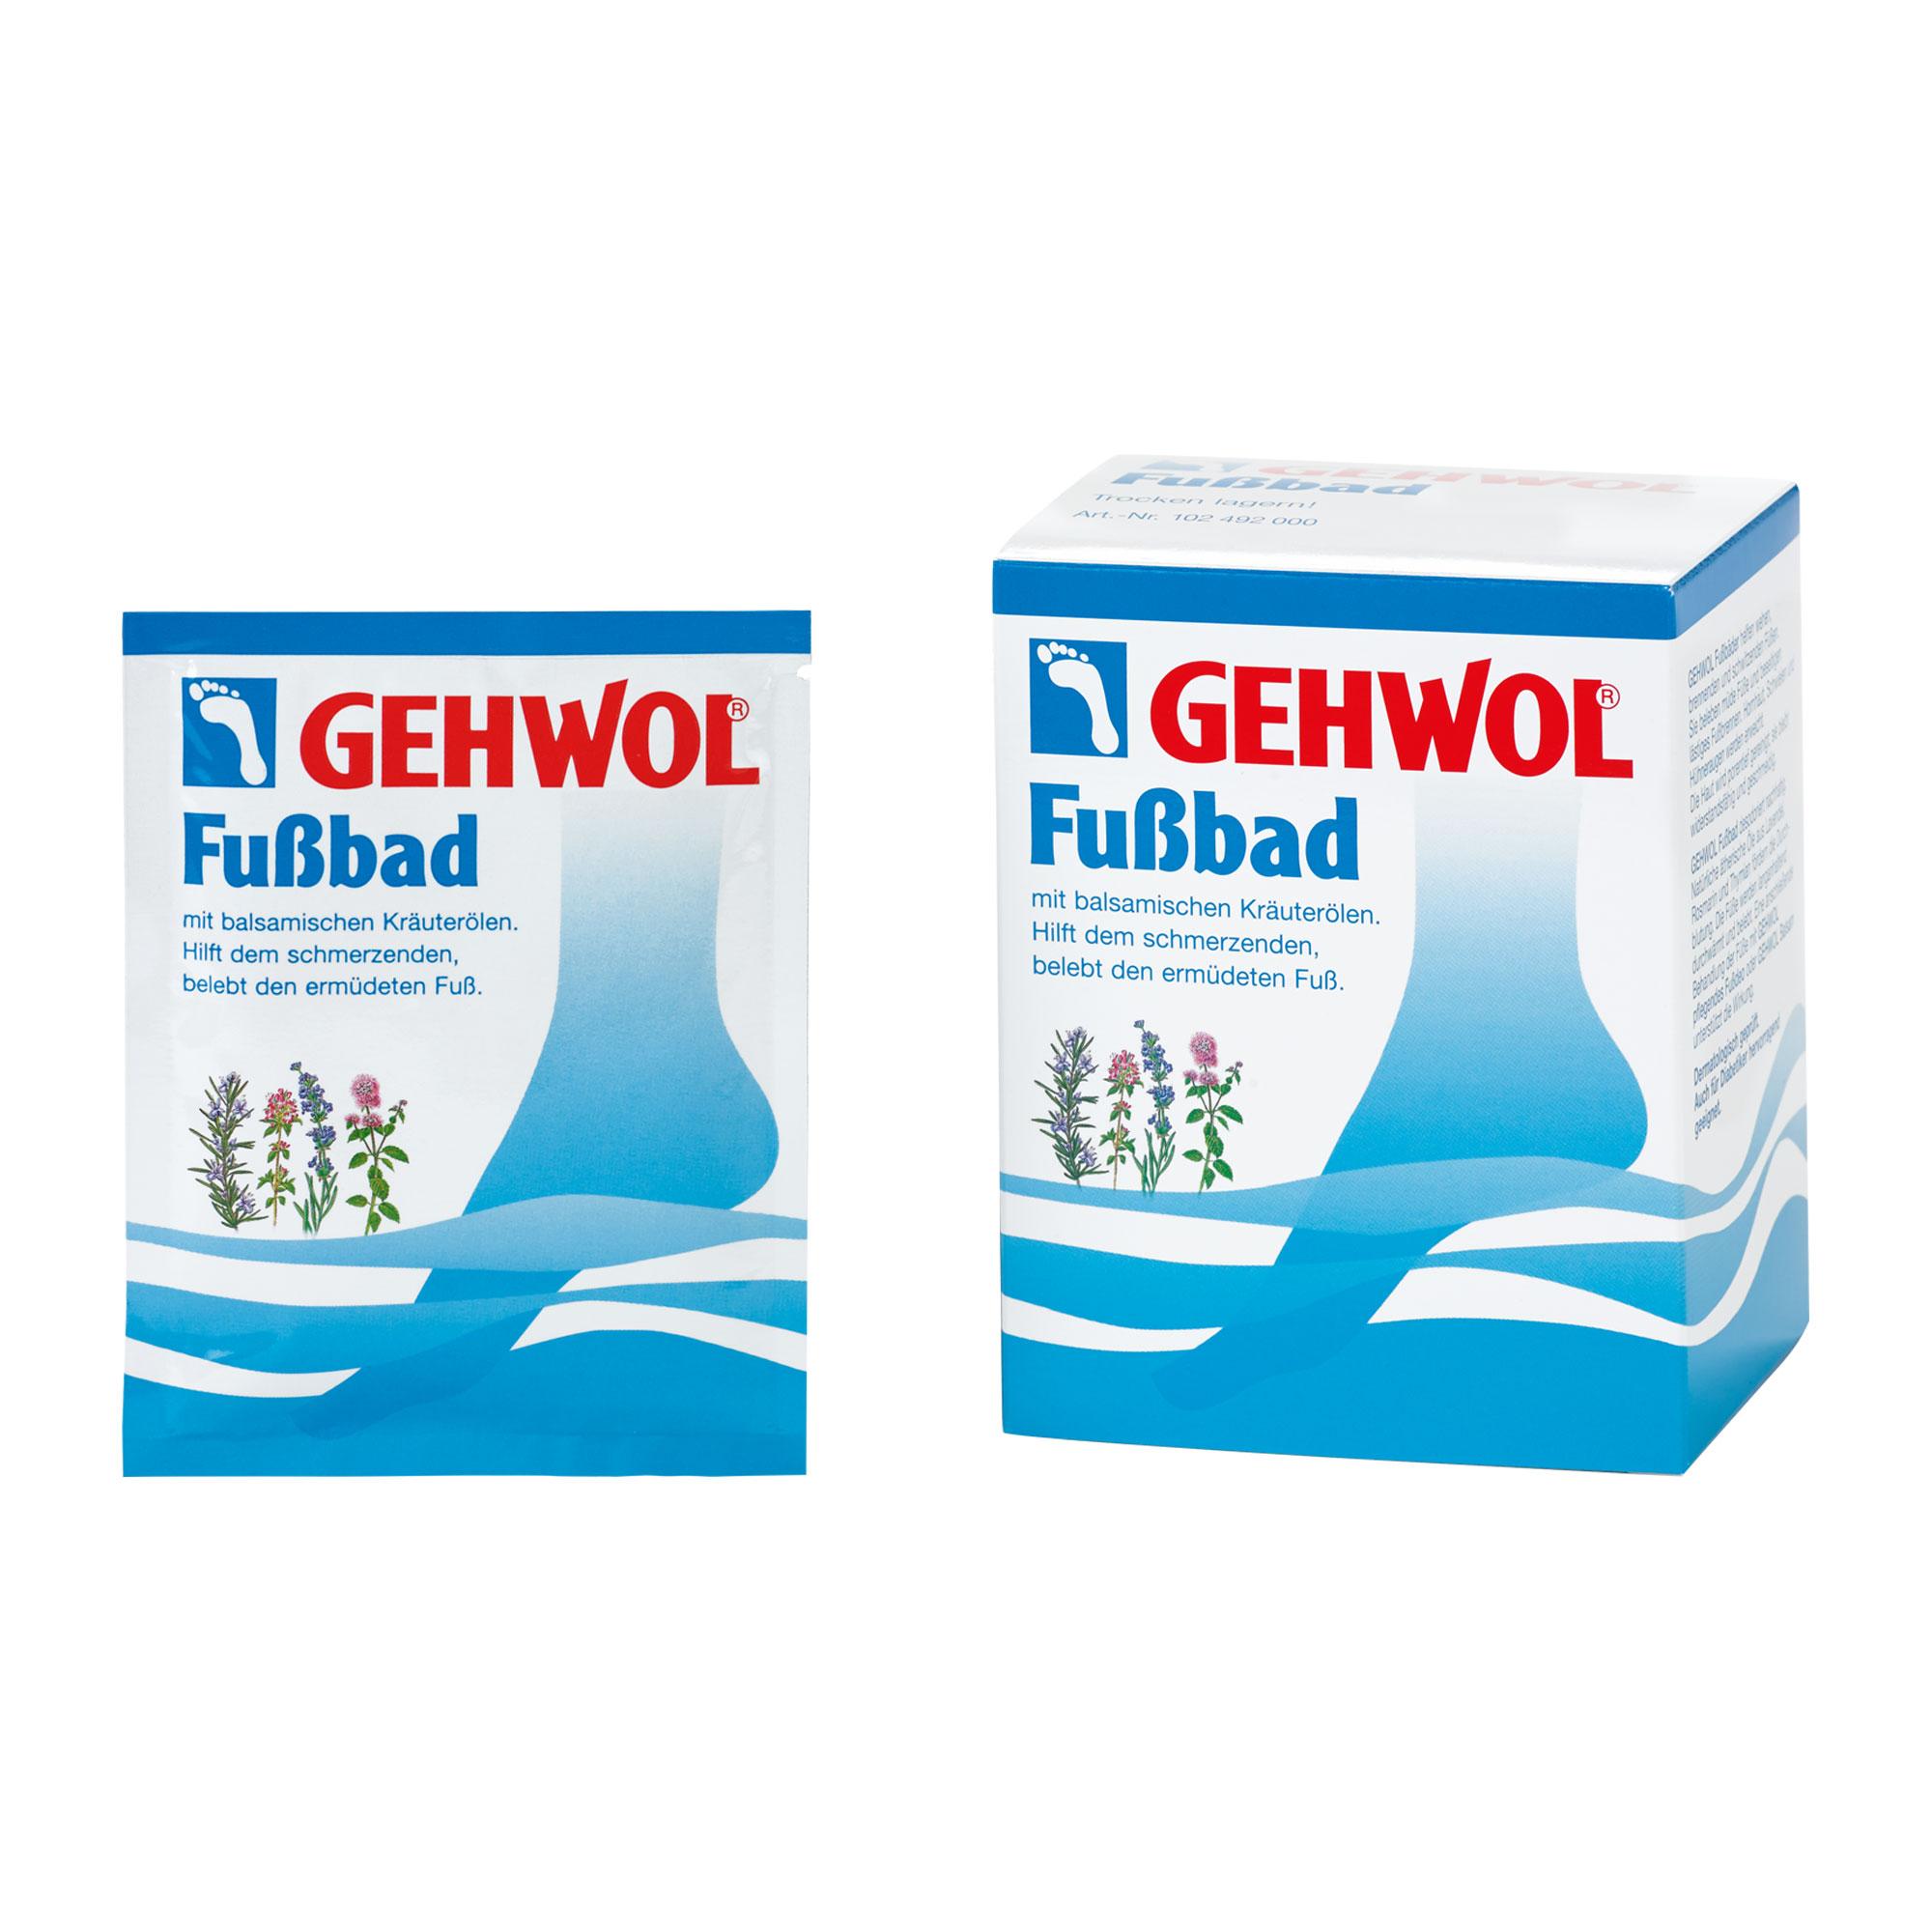 Gehwol Fussbad Portionsbeutel